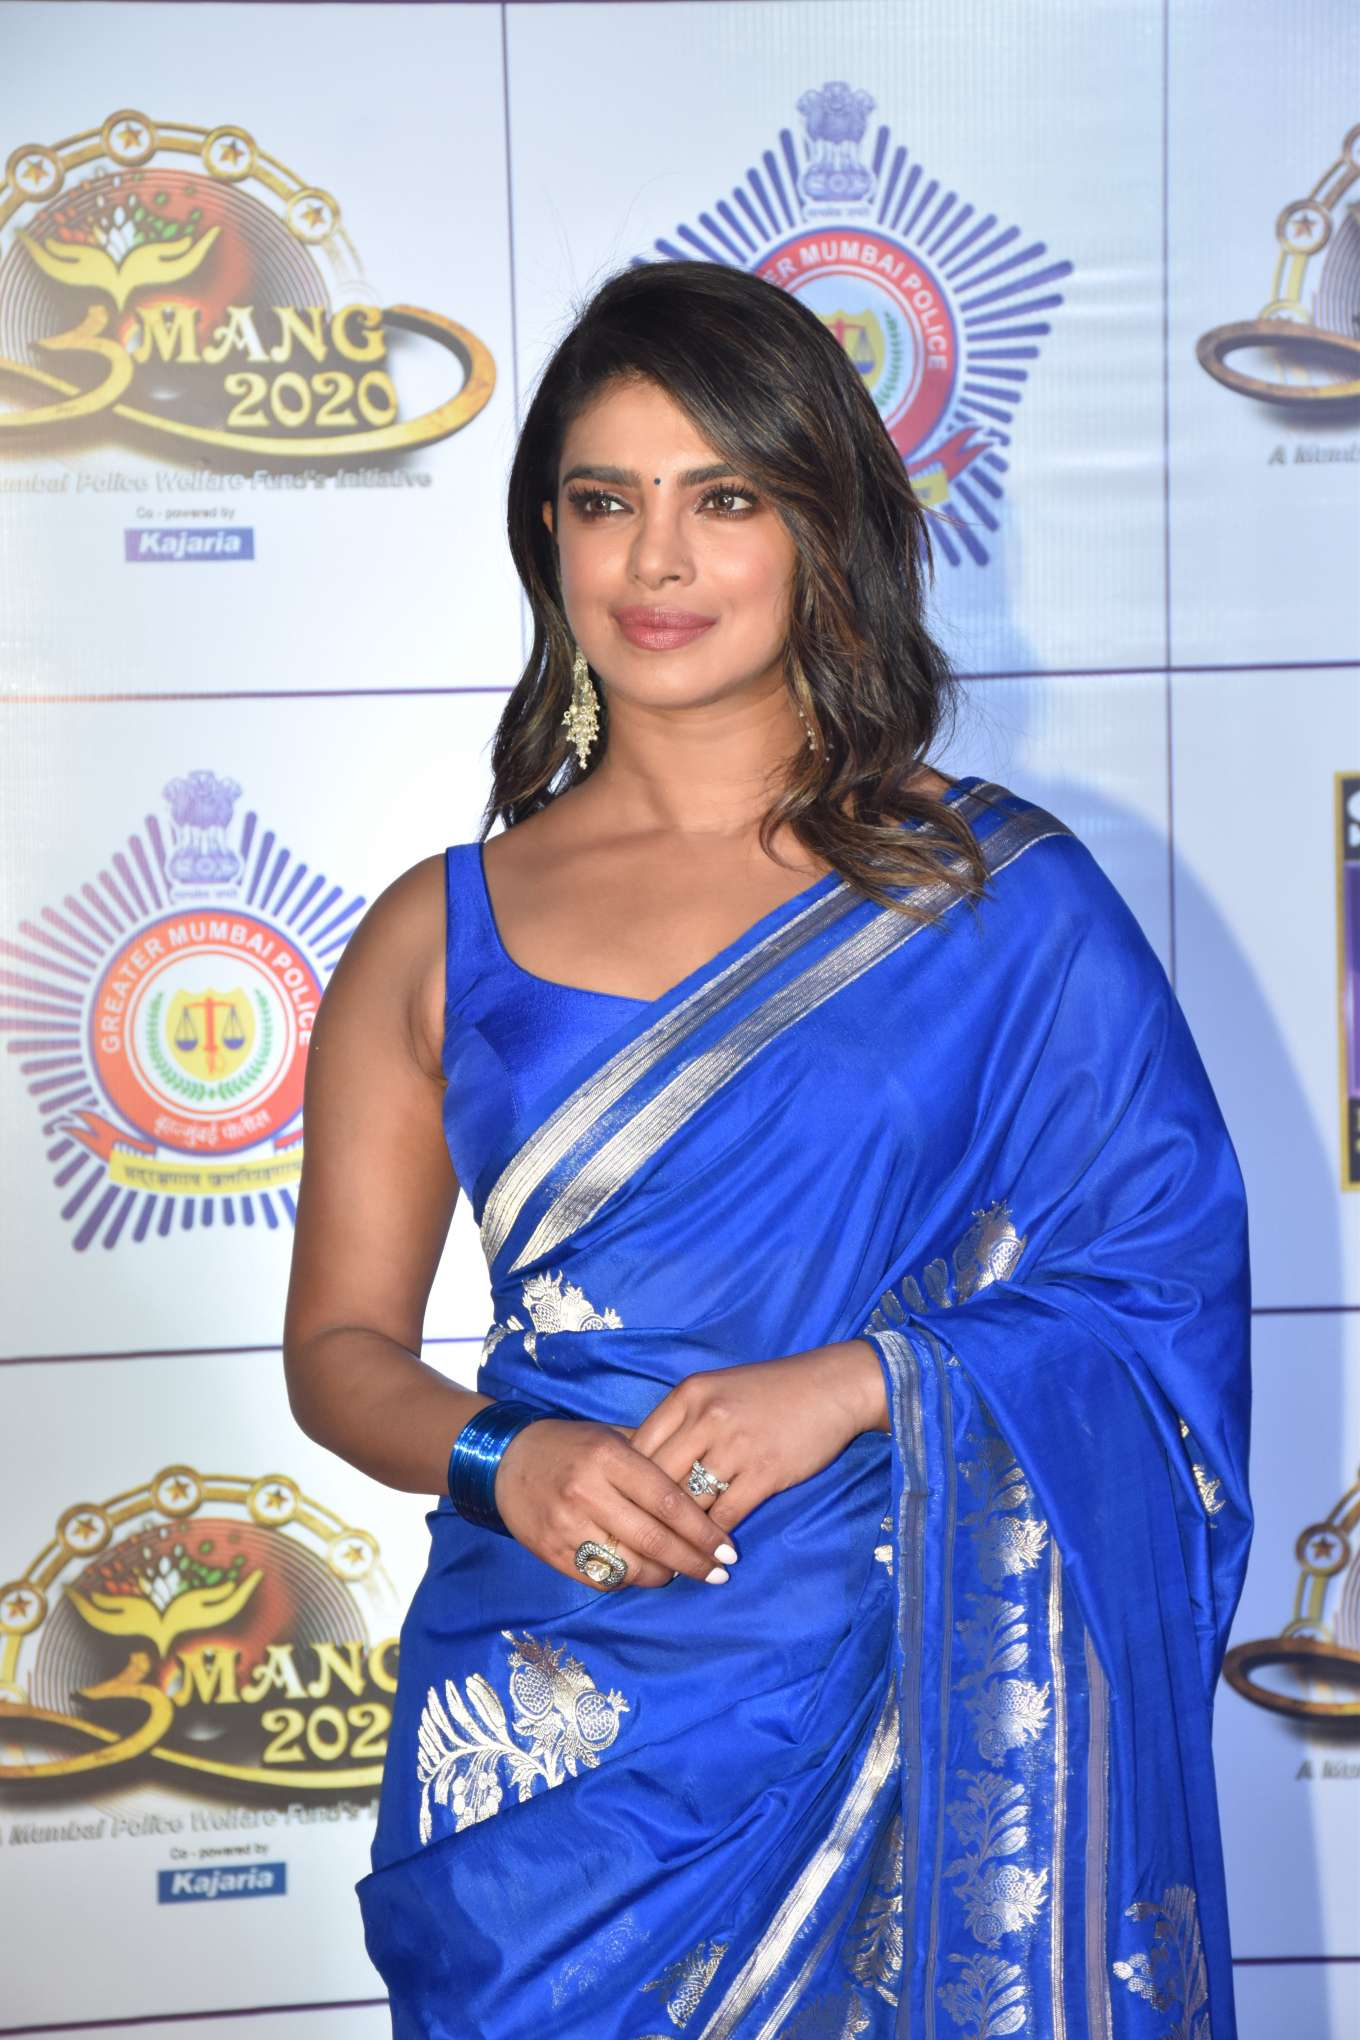 Priyanka Chopra wearing a Royal blue silk dress with a silk material and pleated